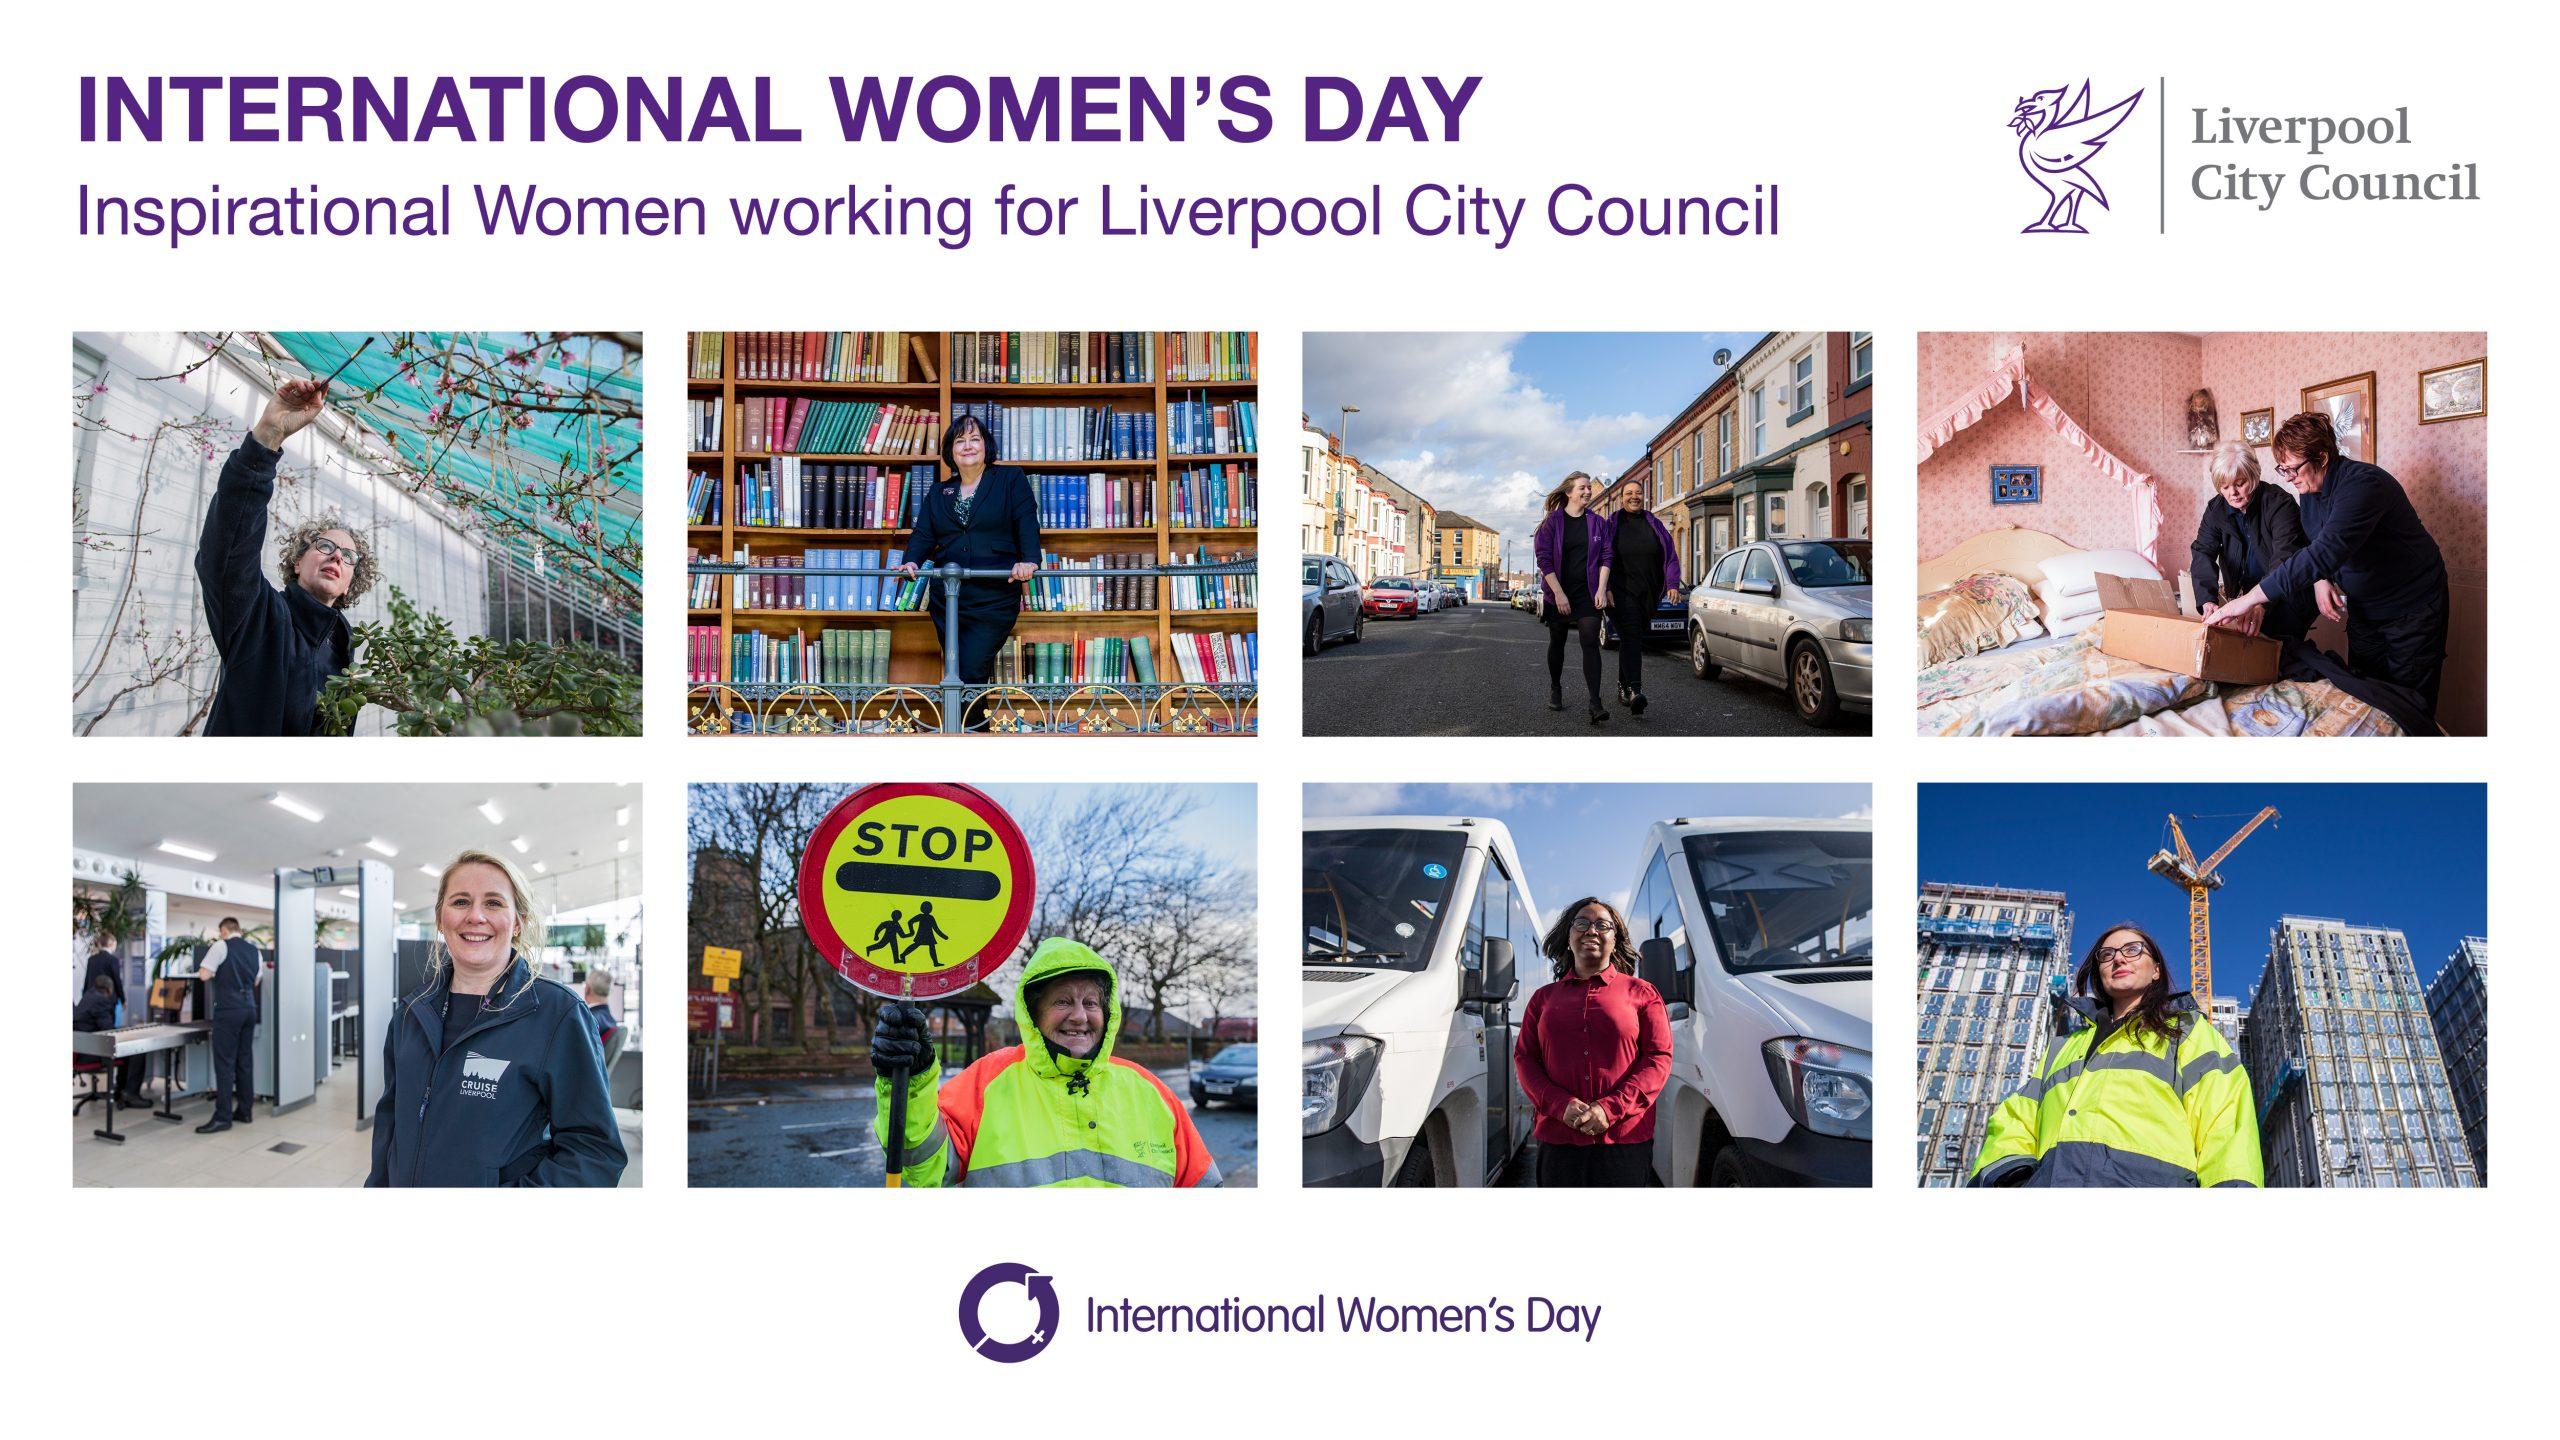 International Woman'sd Day